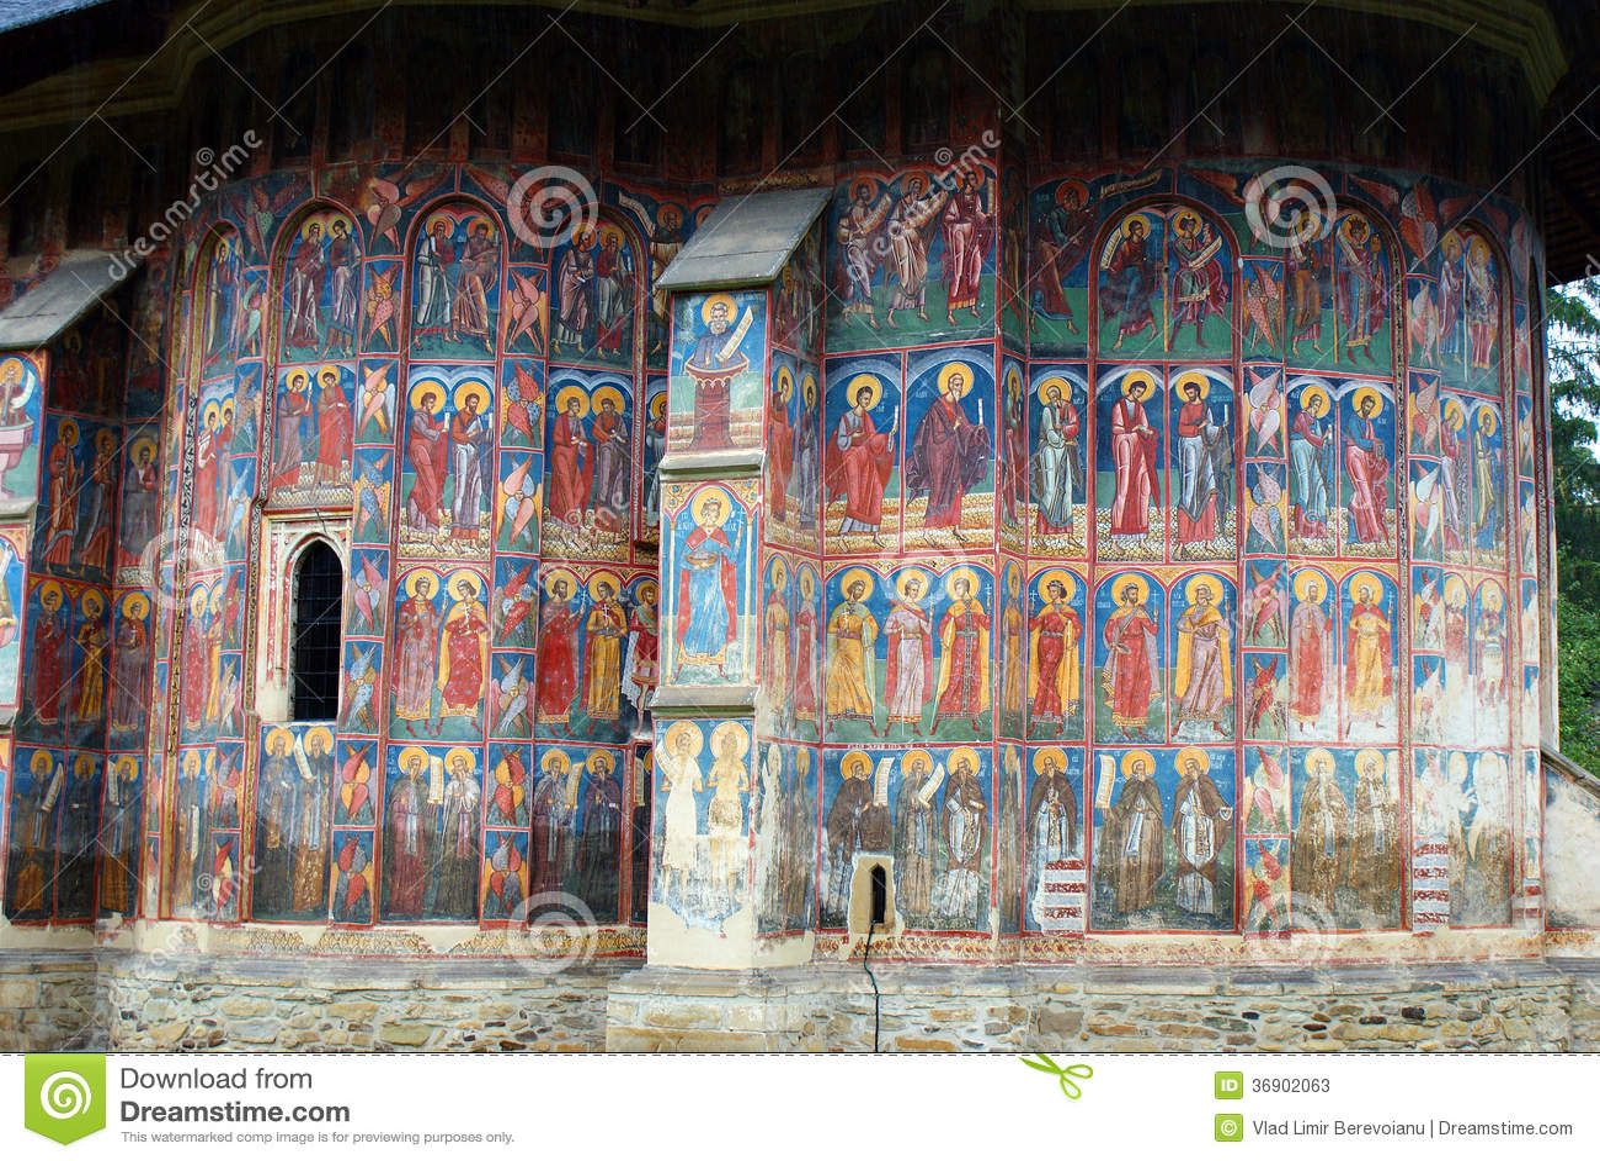 ... Voyage Vers La Roumanie Peintures Murales De Moldovita For Types De Peintures  Murales ...